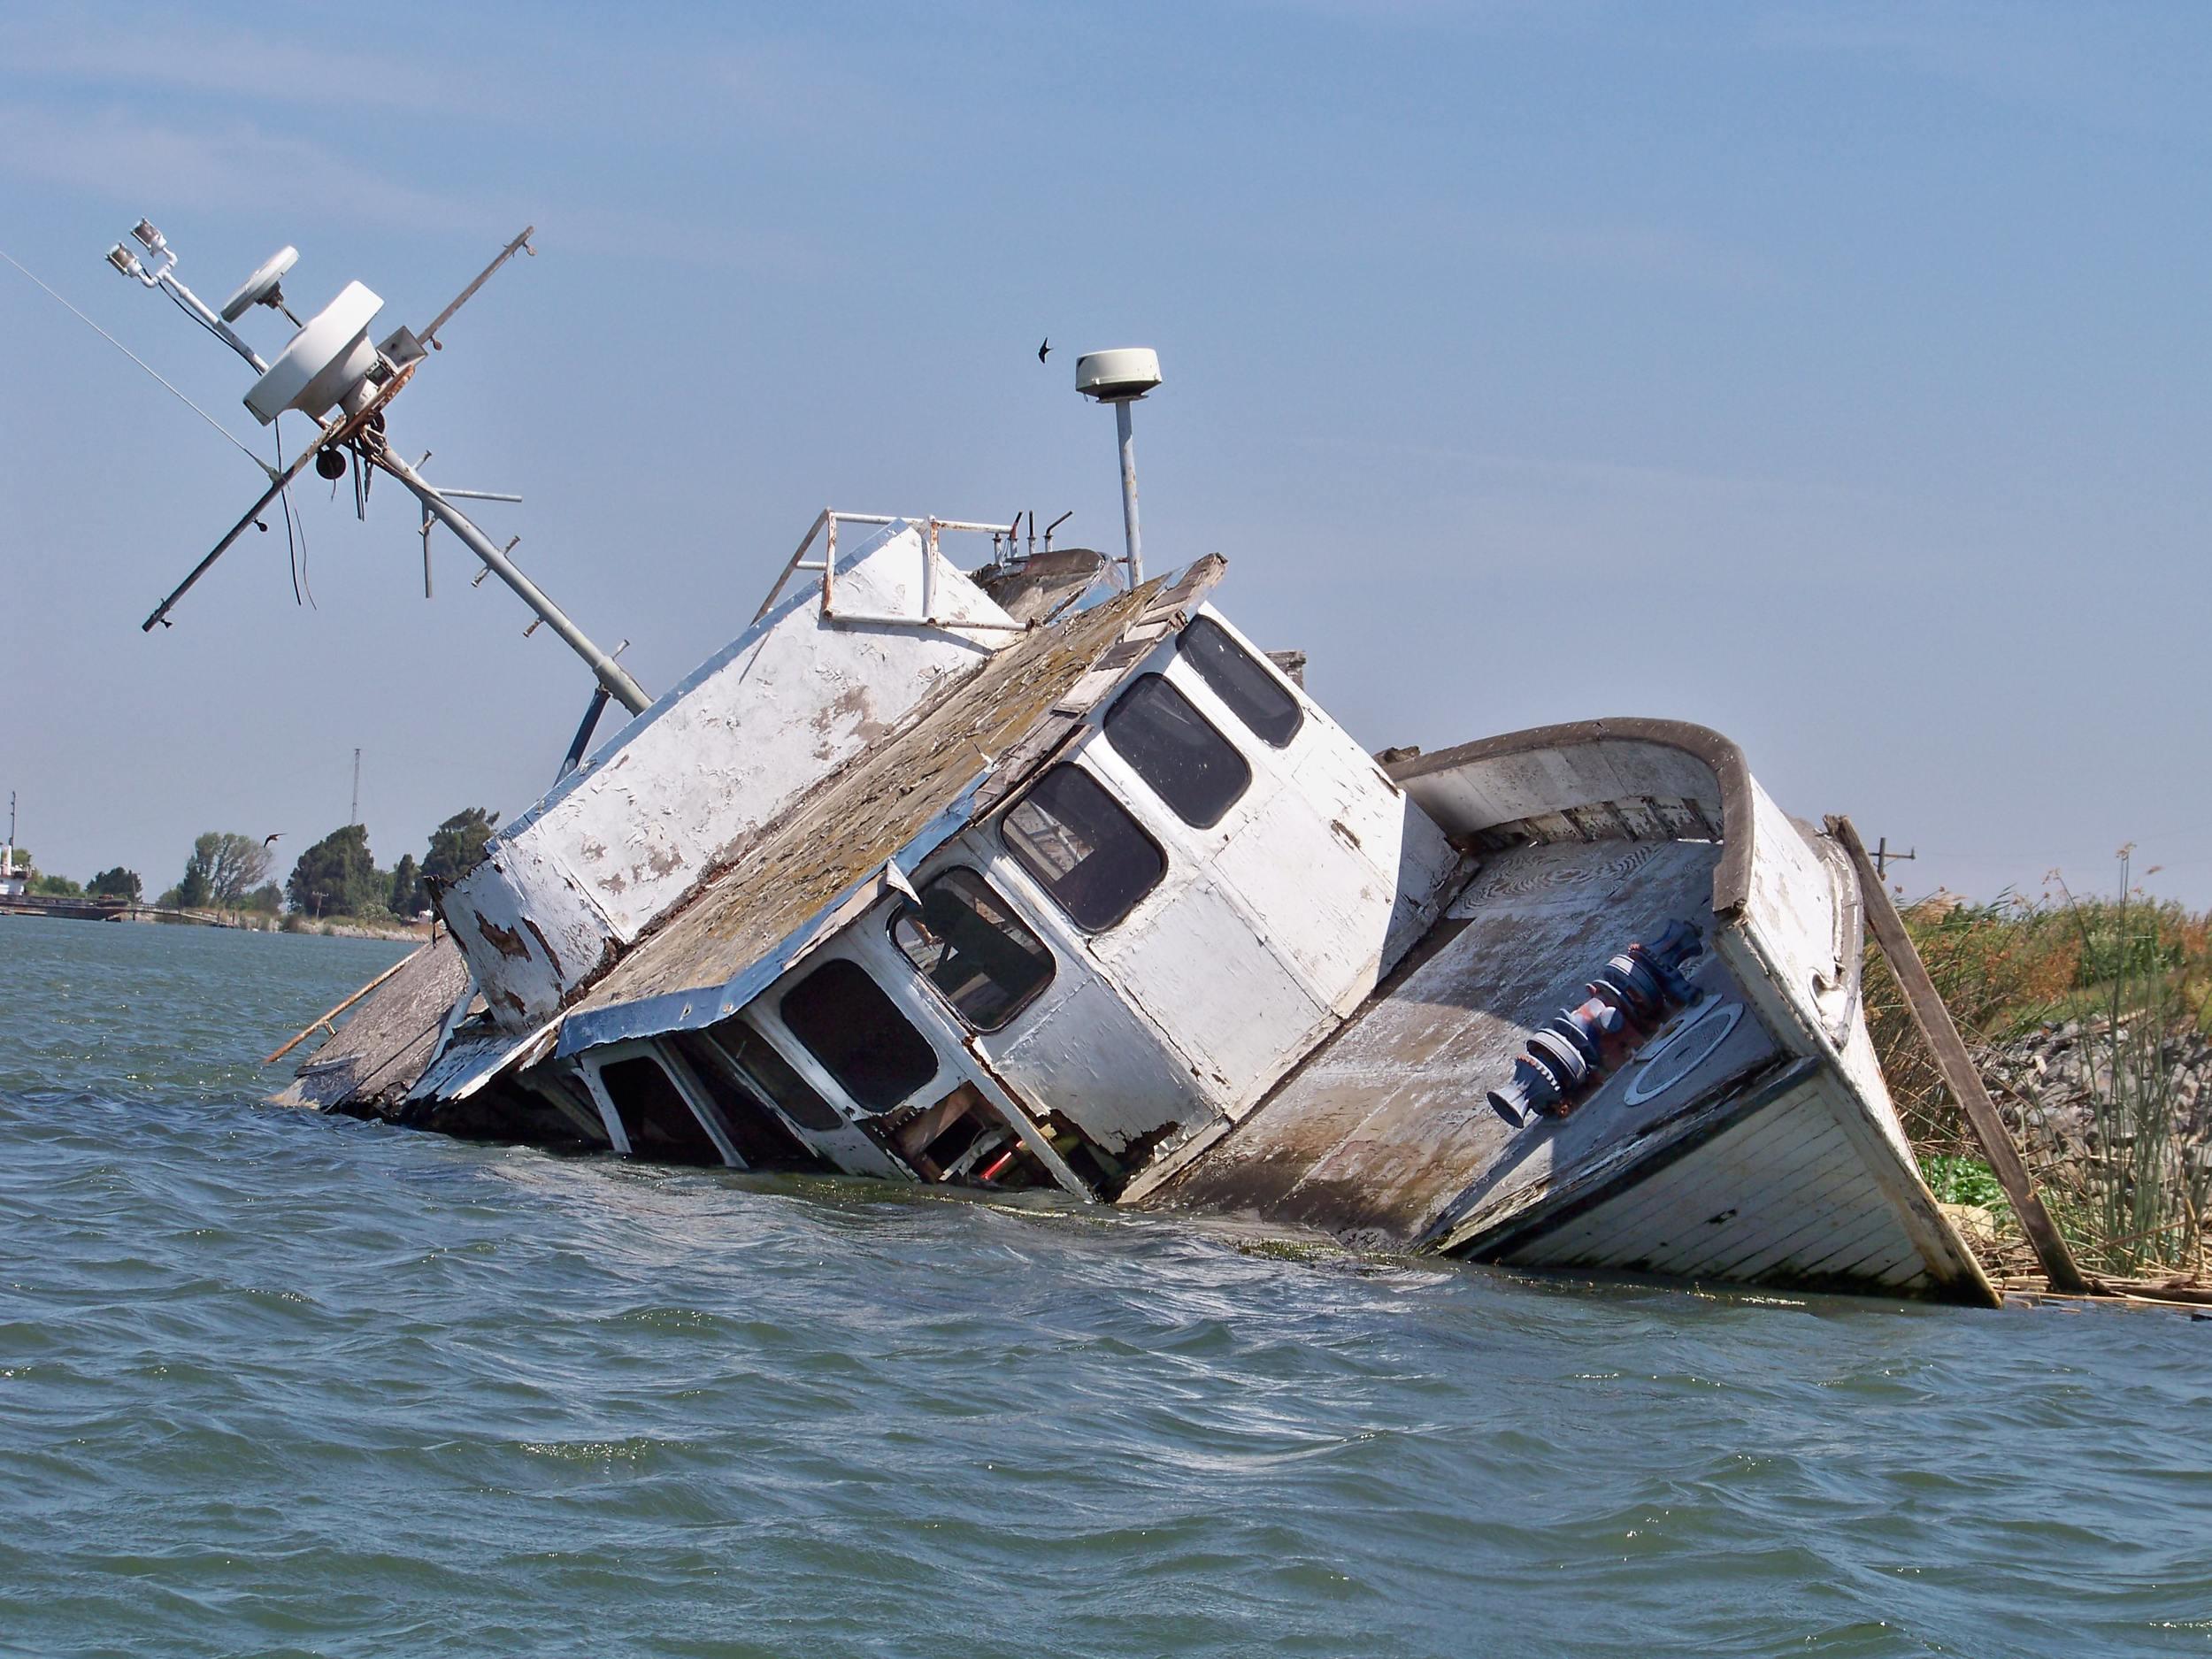 One of many Delta boat wrecks, Fisherman's Cut